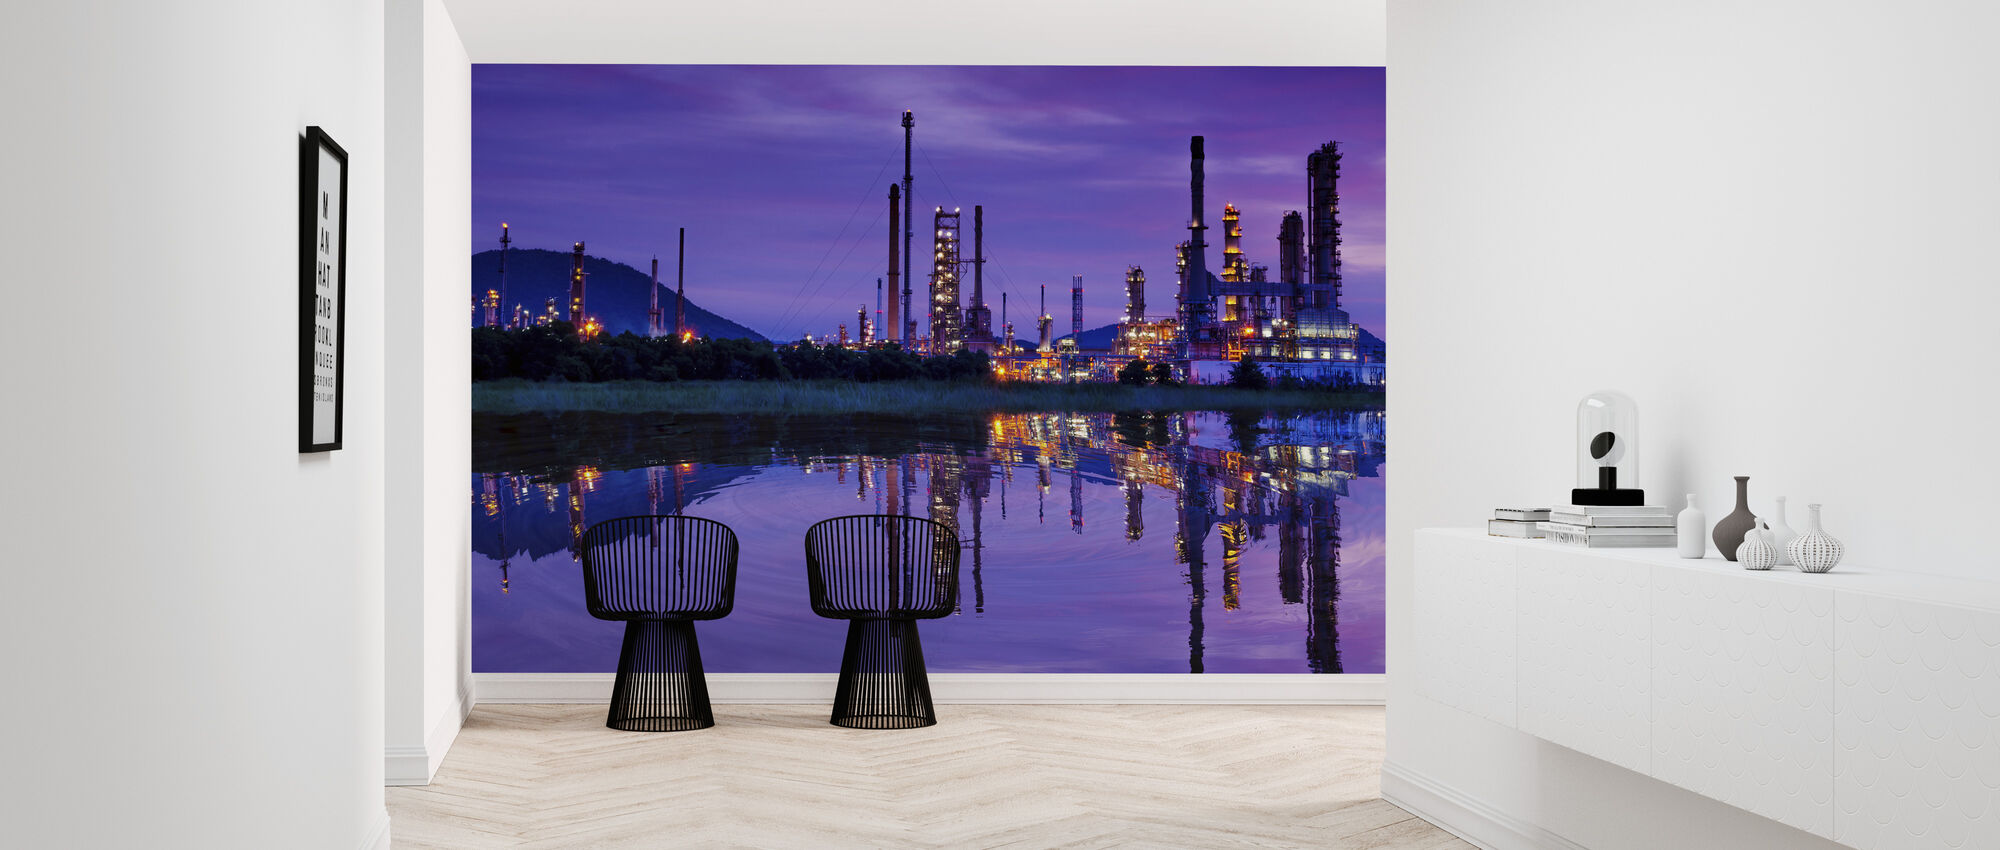 Petrochemical Industry - Wallpaper - Hallway